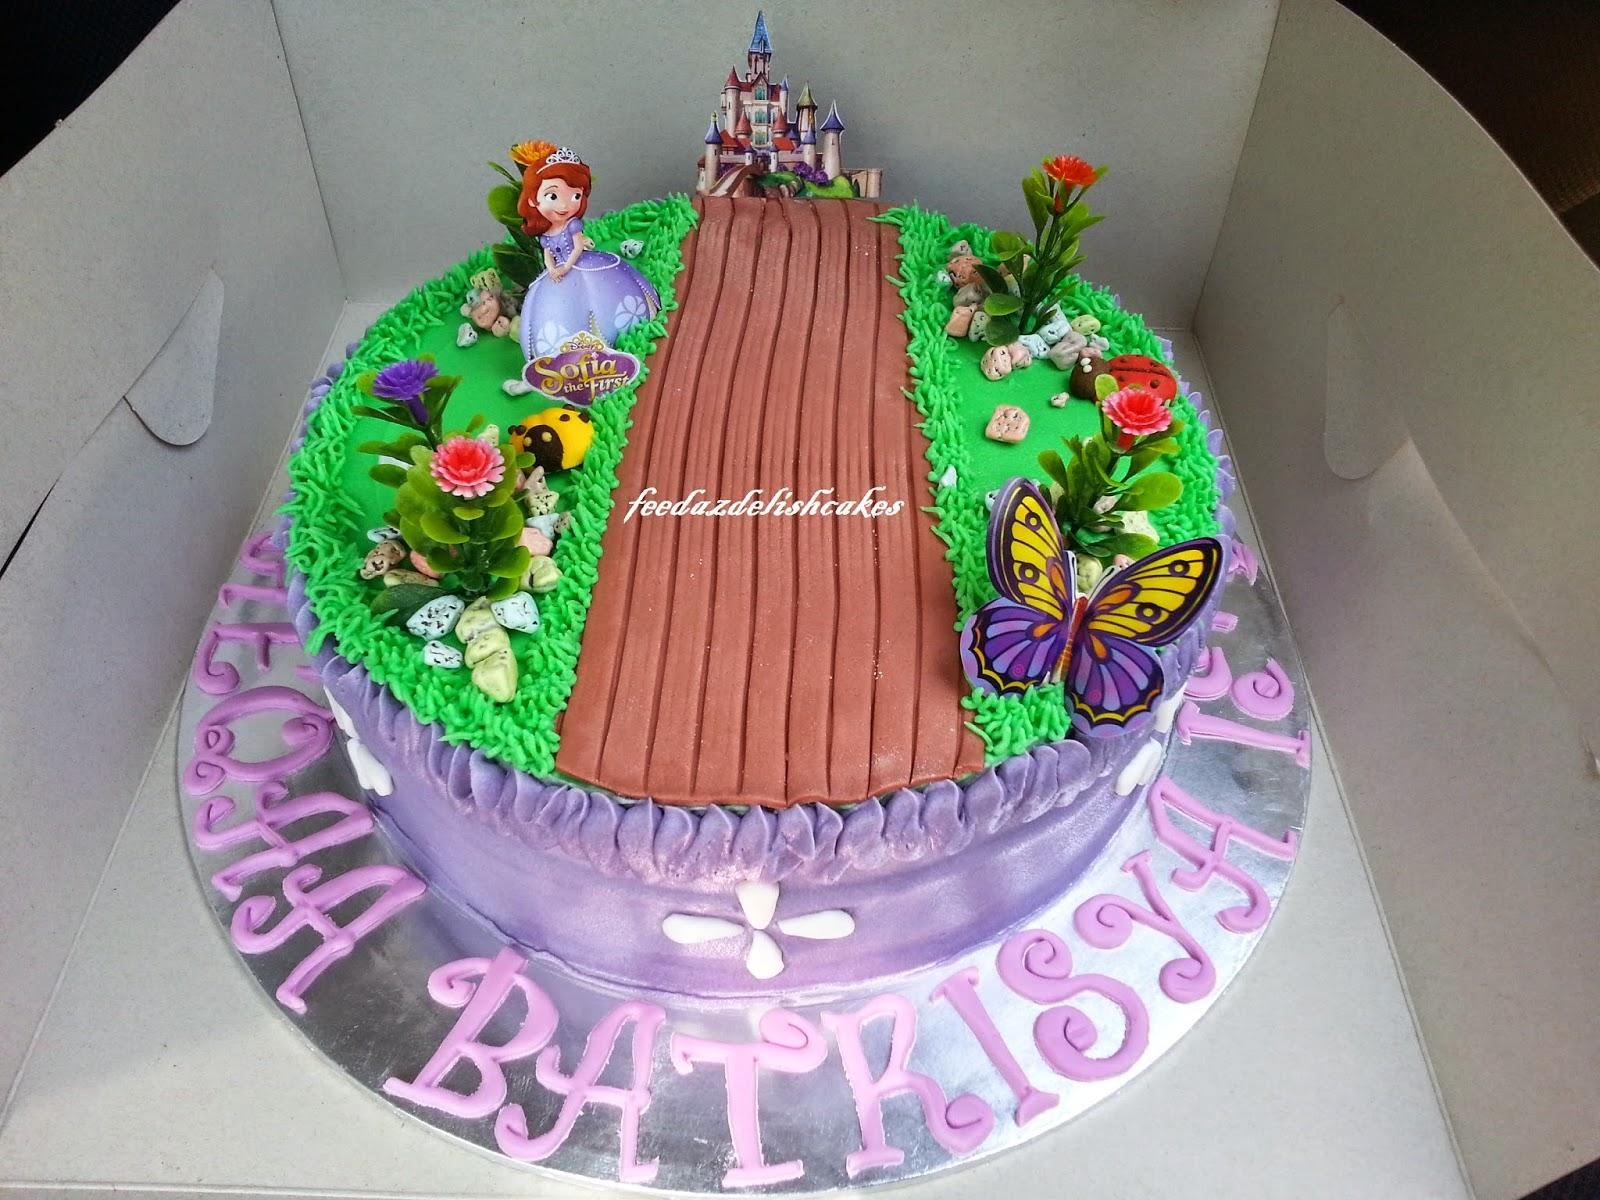 feedazdelishcakes Sofia the First themed cake Moist choc cake with